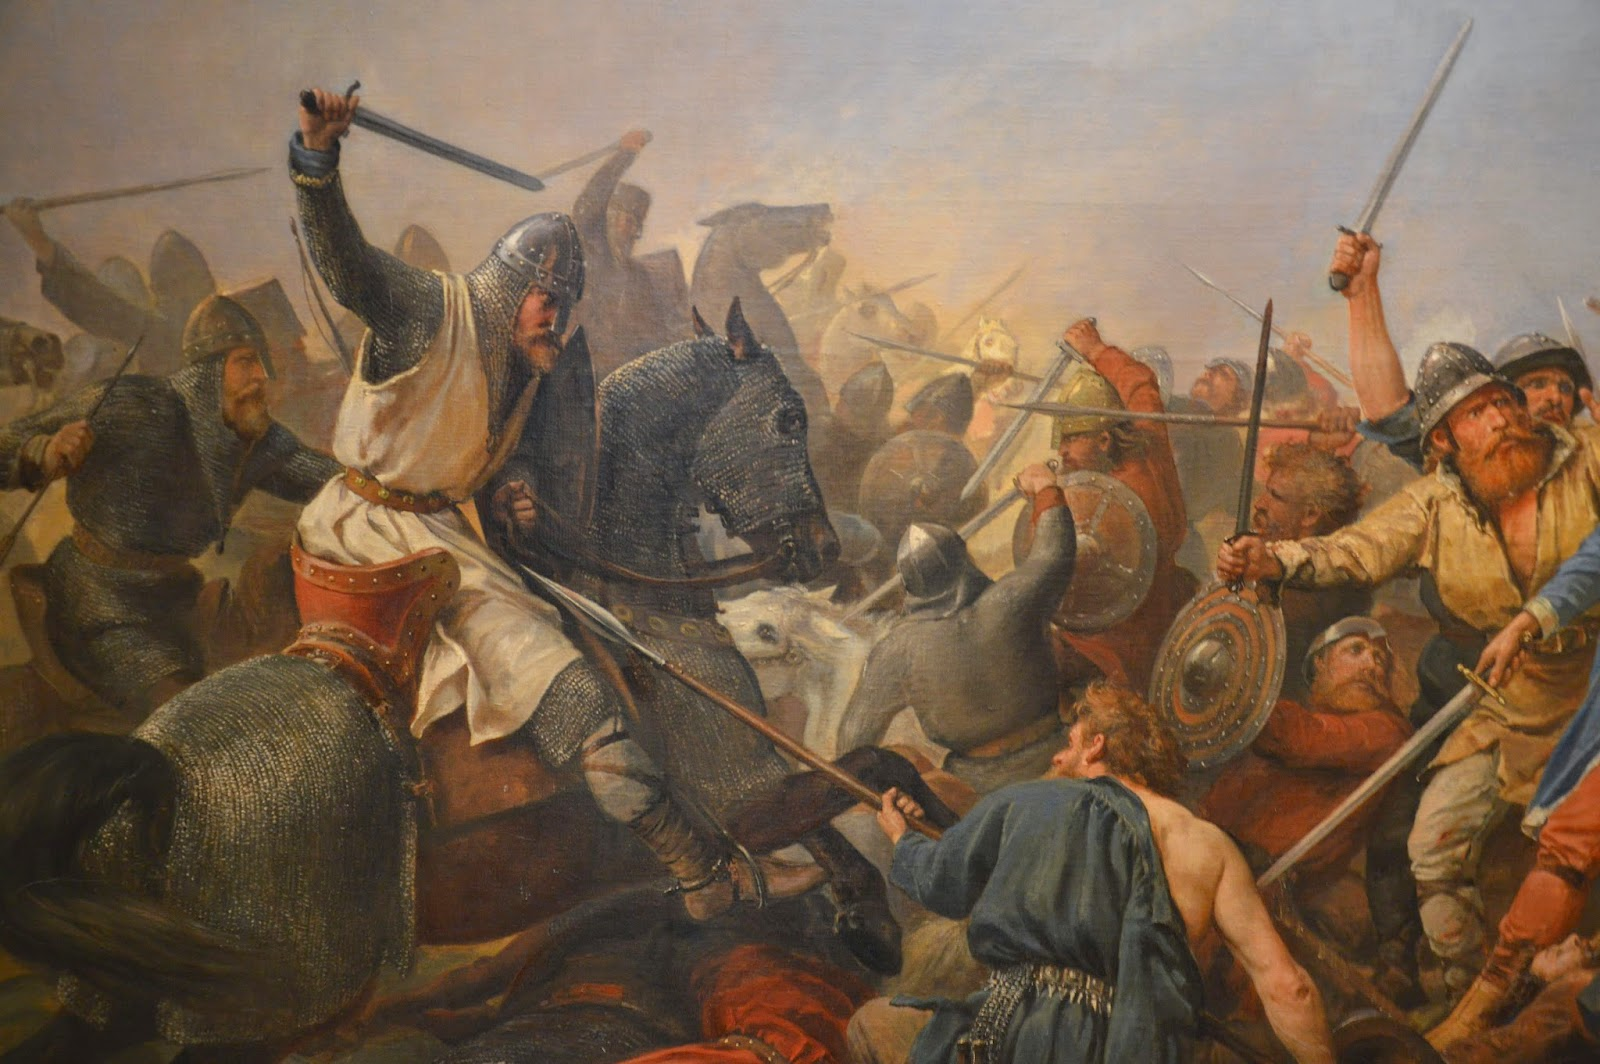 the battle of power Battle of the alamo facts dates february 23, 1836 – march 6, 1836 location san antonio de bexar, texas republic, now: san antonio, texas generals/commanders.